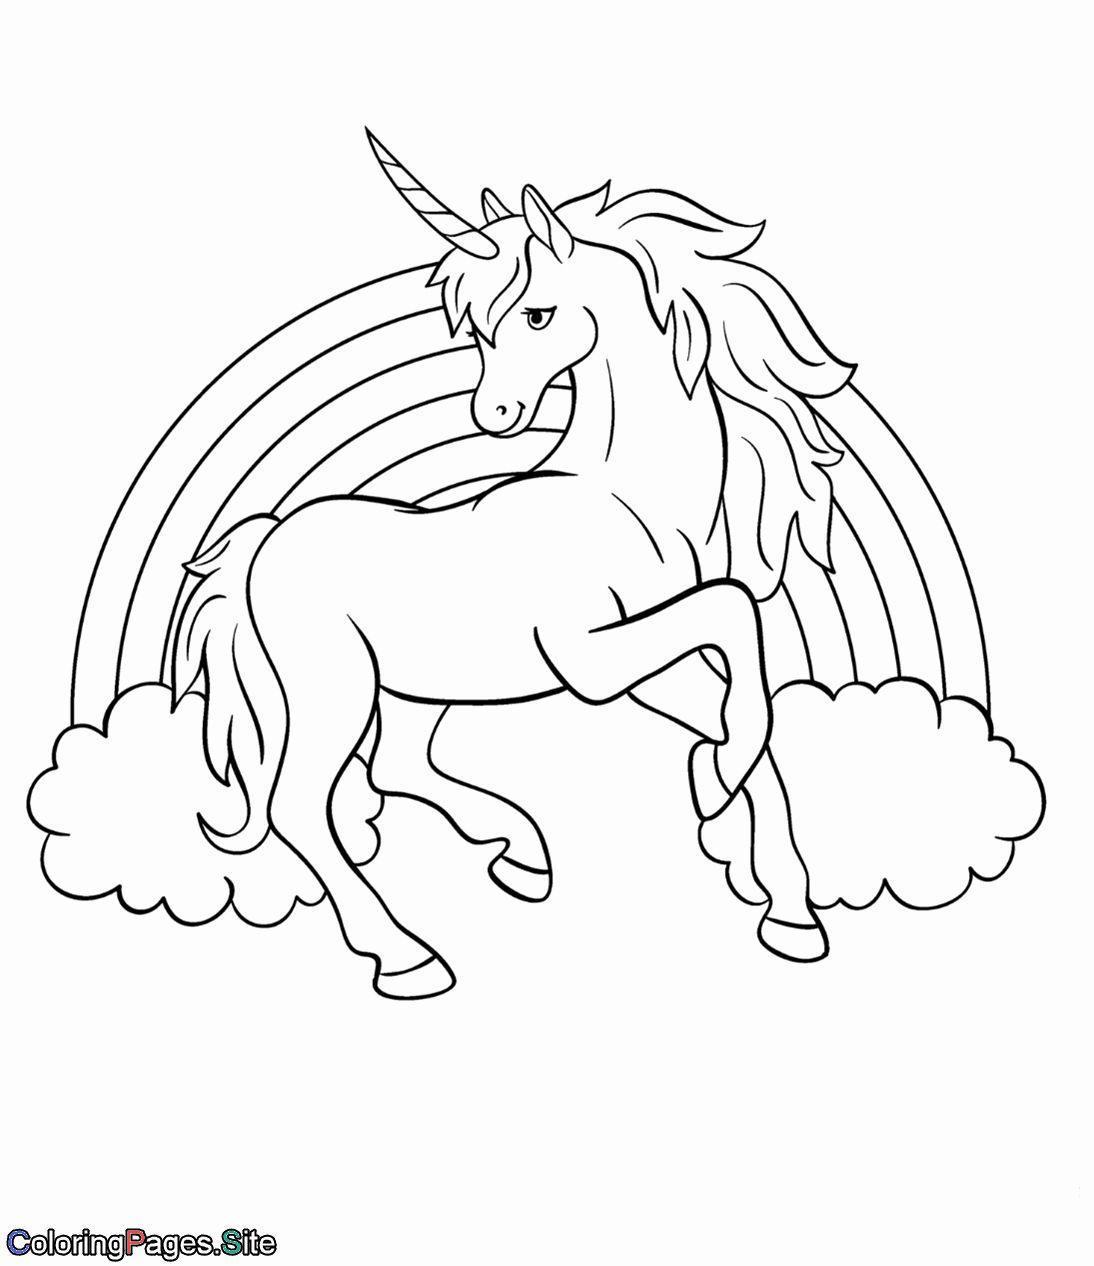 Printable Coloring Pages Unicorns Best Of Huba Huba Fargelegging Fargeleggingsark Regnbue